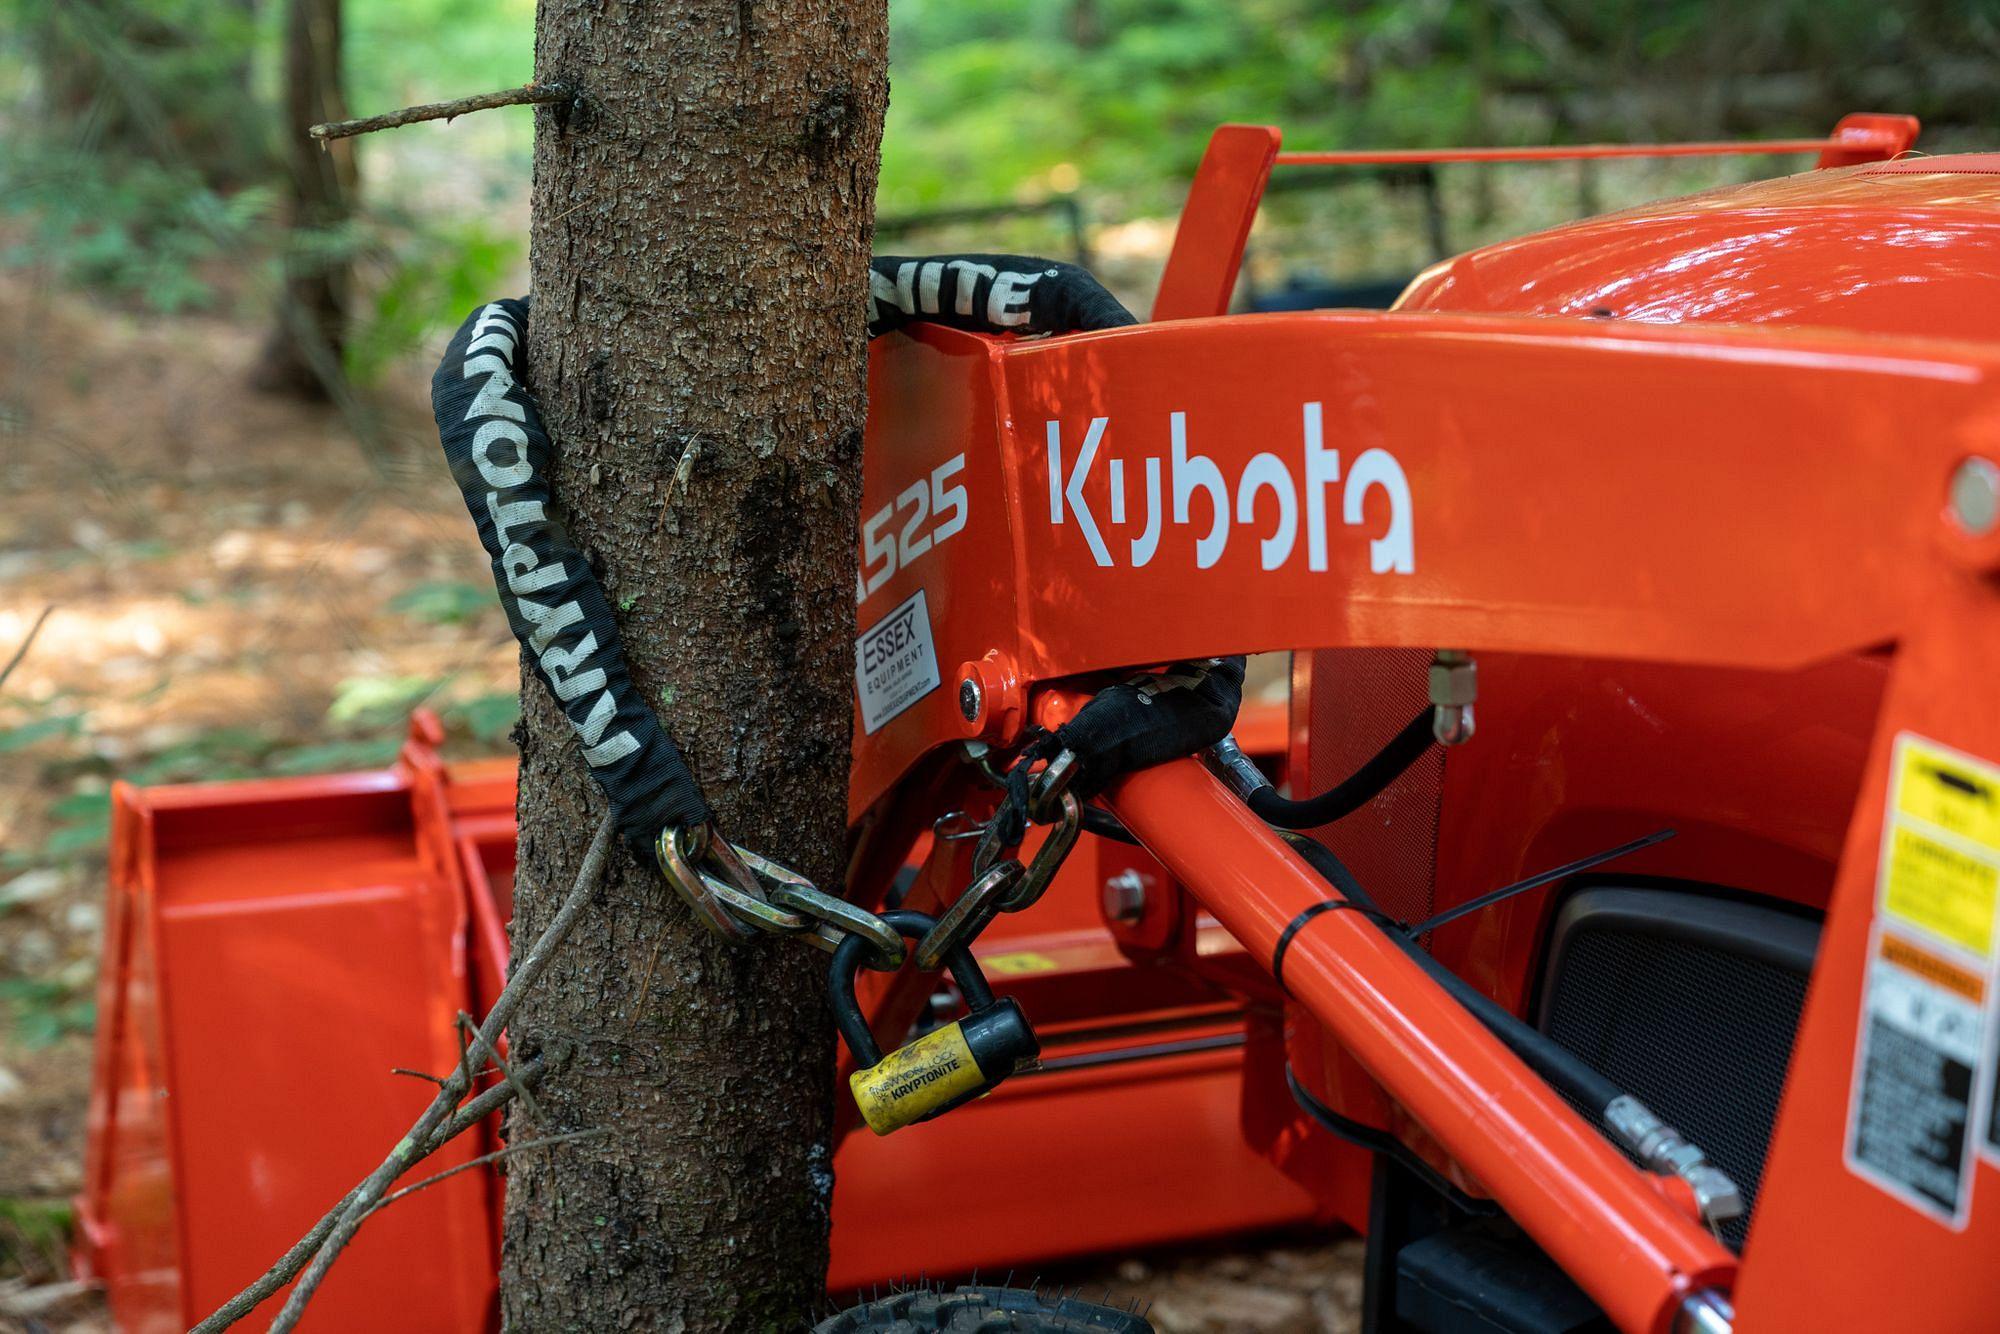 Kubota Tractor Security